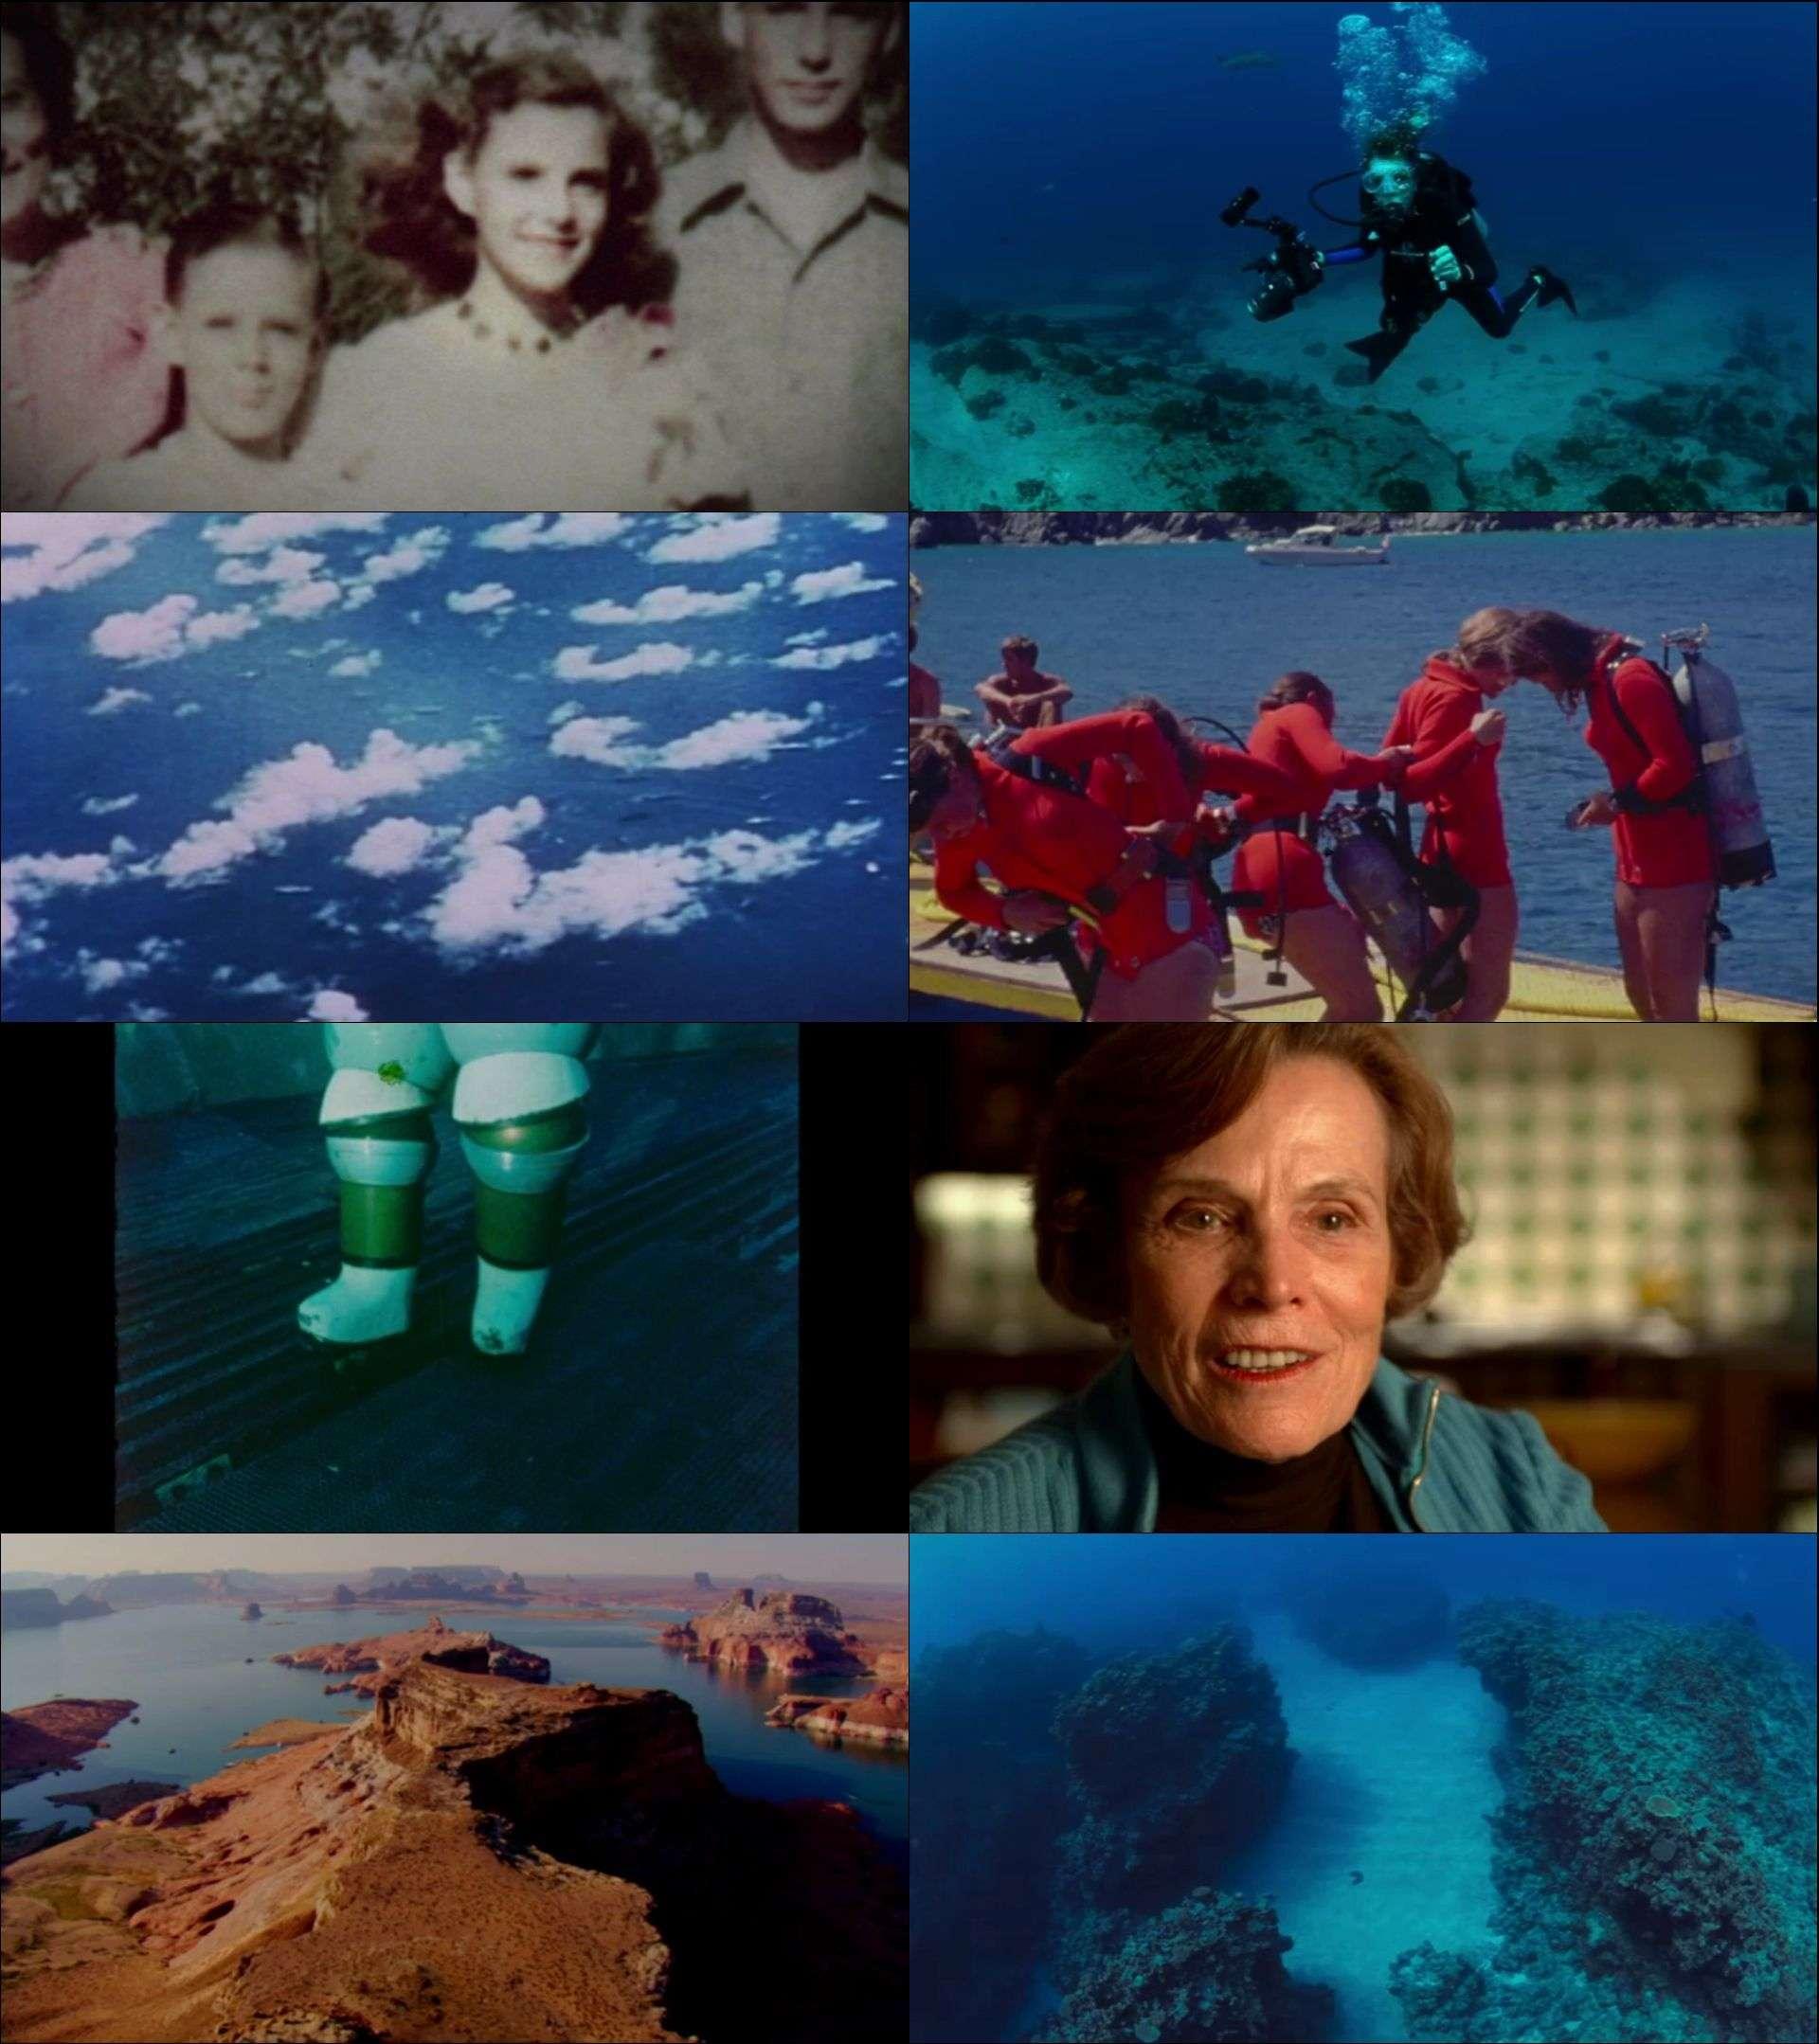 Mavi Görev - Mission Blue (2014) türkçe dublaj film indir